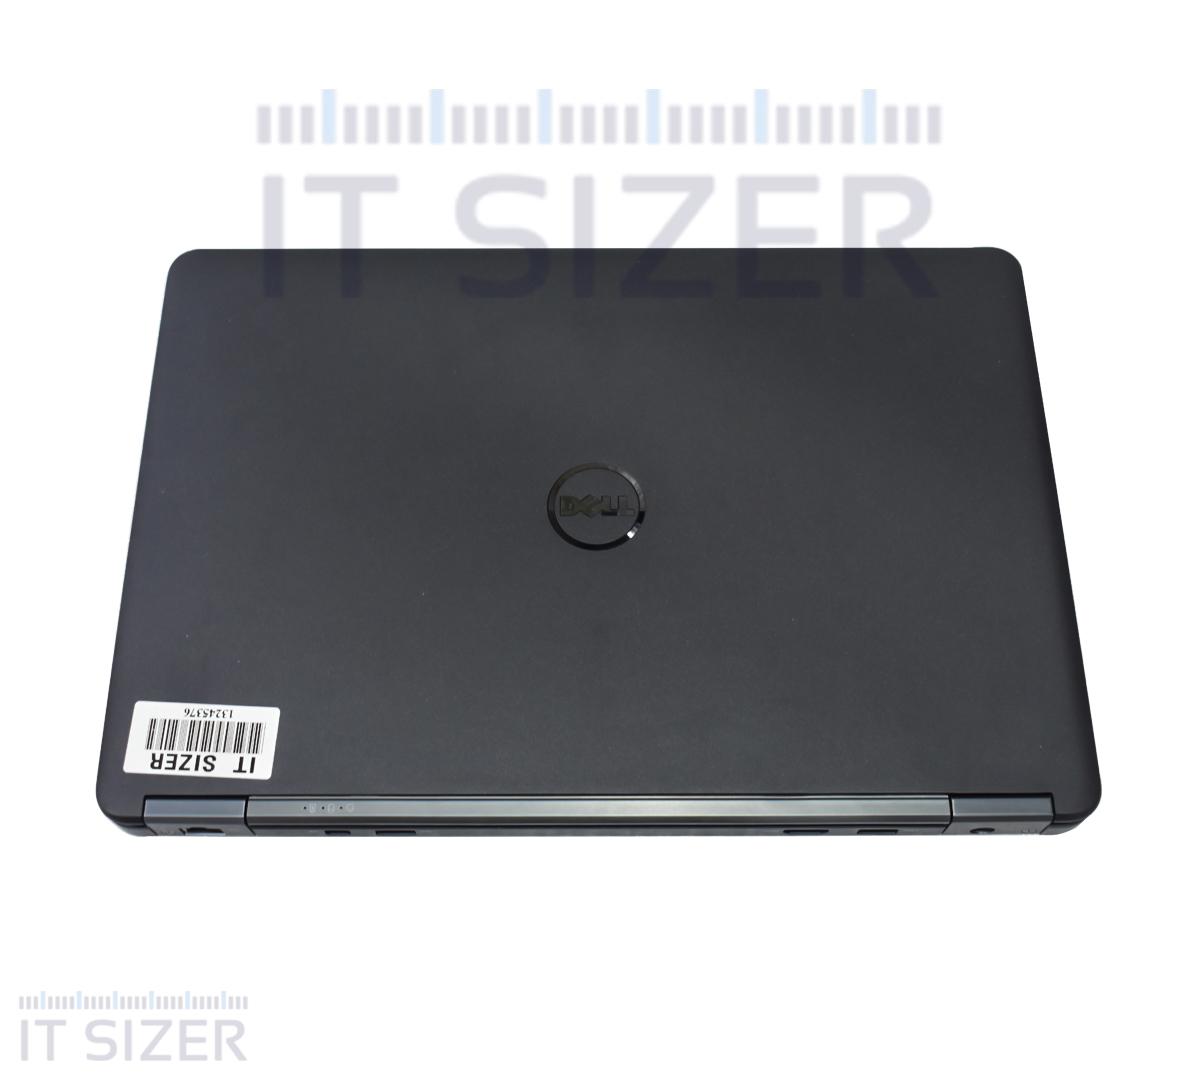 Dell Latitude E7450 Business Laptop, INTEL CORE I5-5300U CPU, 8GB DDR3L SODIMM RAM, 256GB SSD 2.5, 14 inch Display, Windows 10 Pro (Renewed)